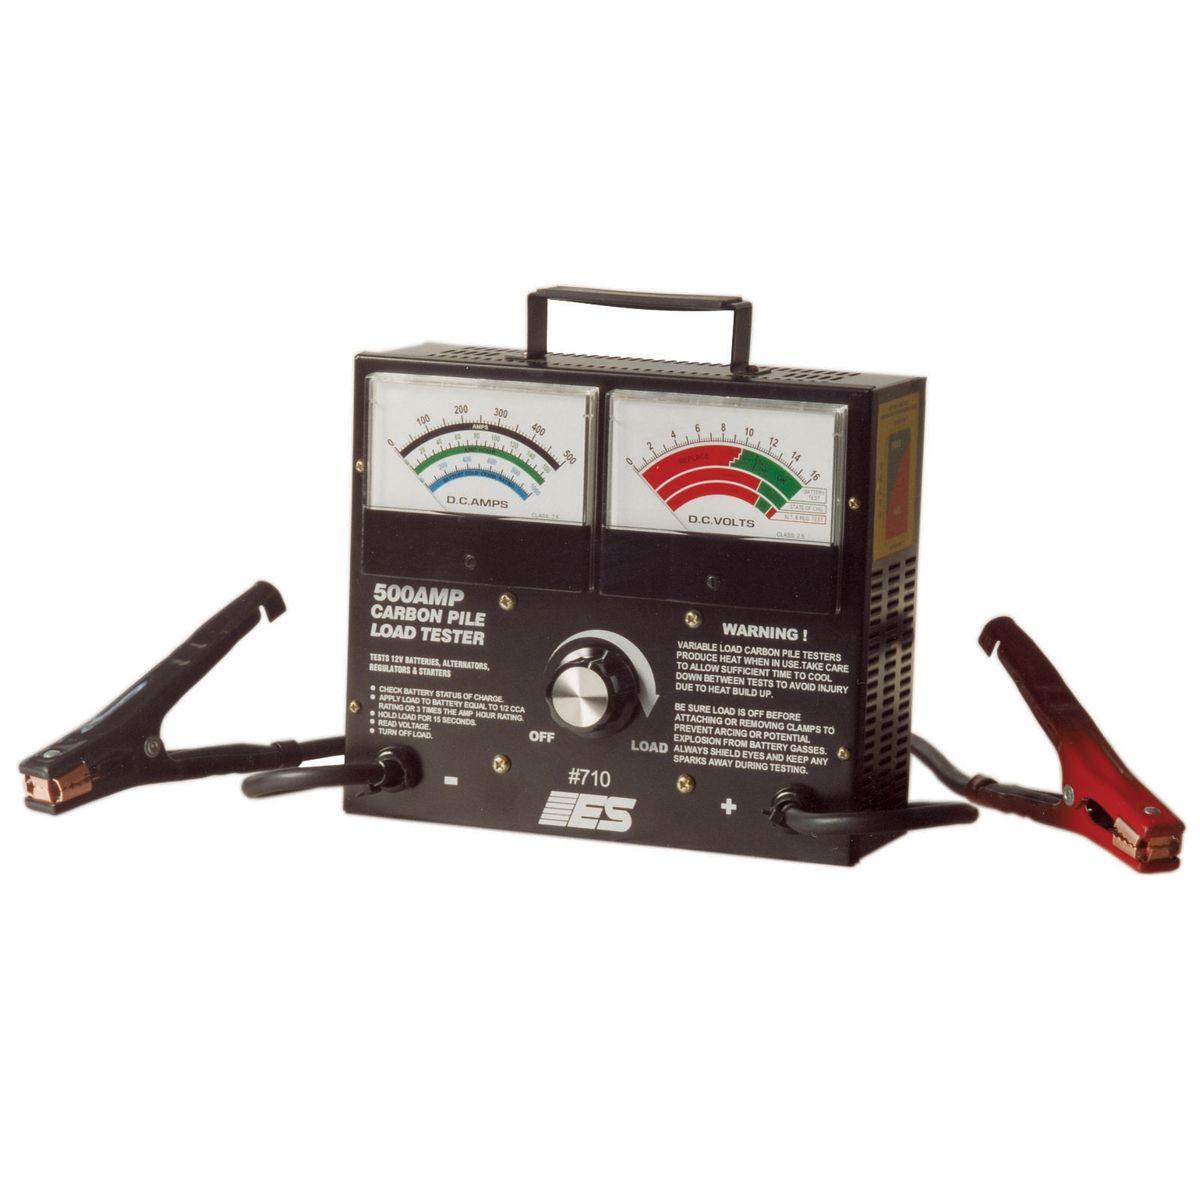 Elec Specialties 706 Digital Battery Tester W//Auto Test